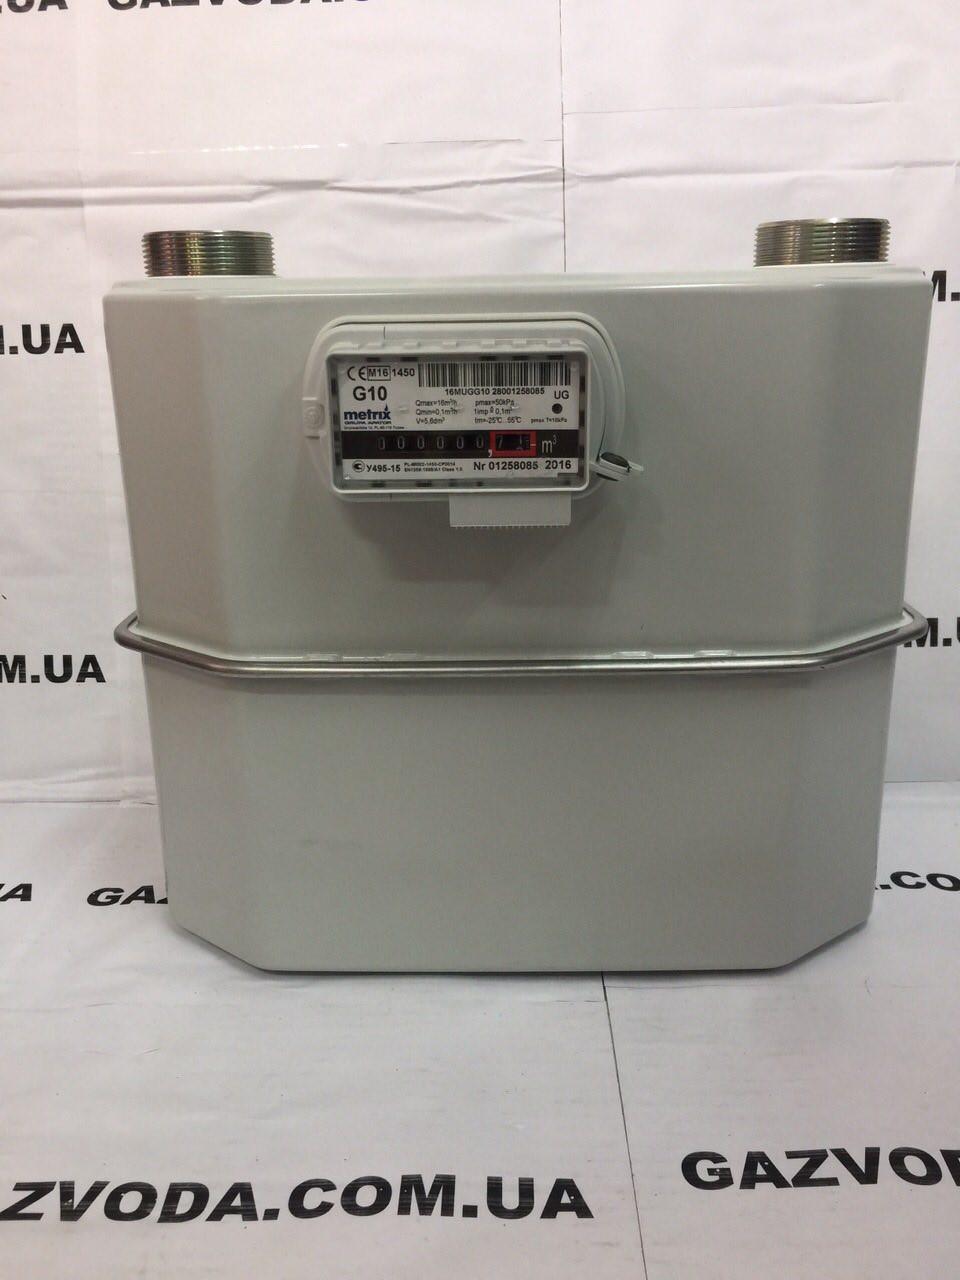 Счетчик газа Metrix G10